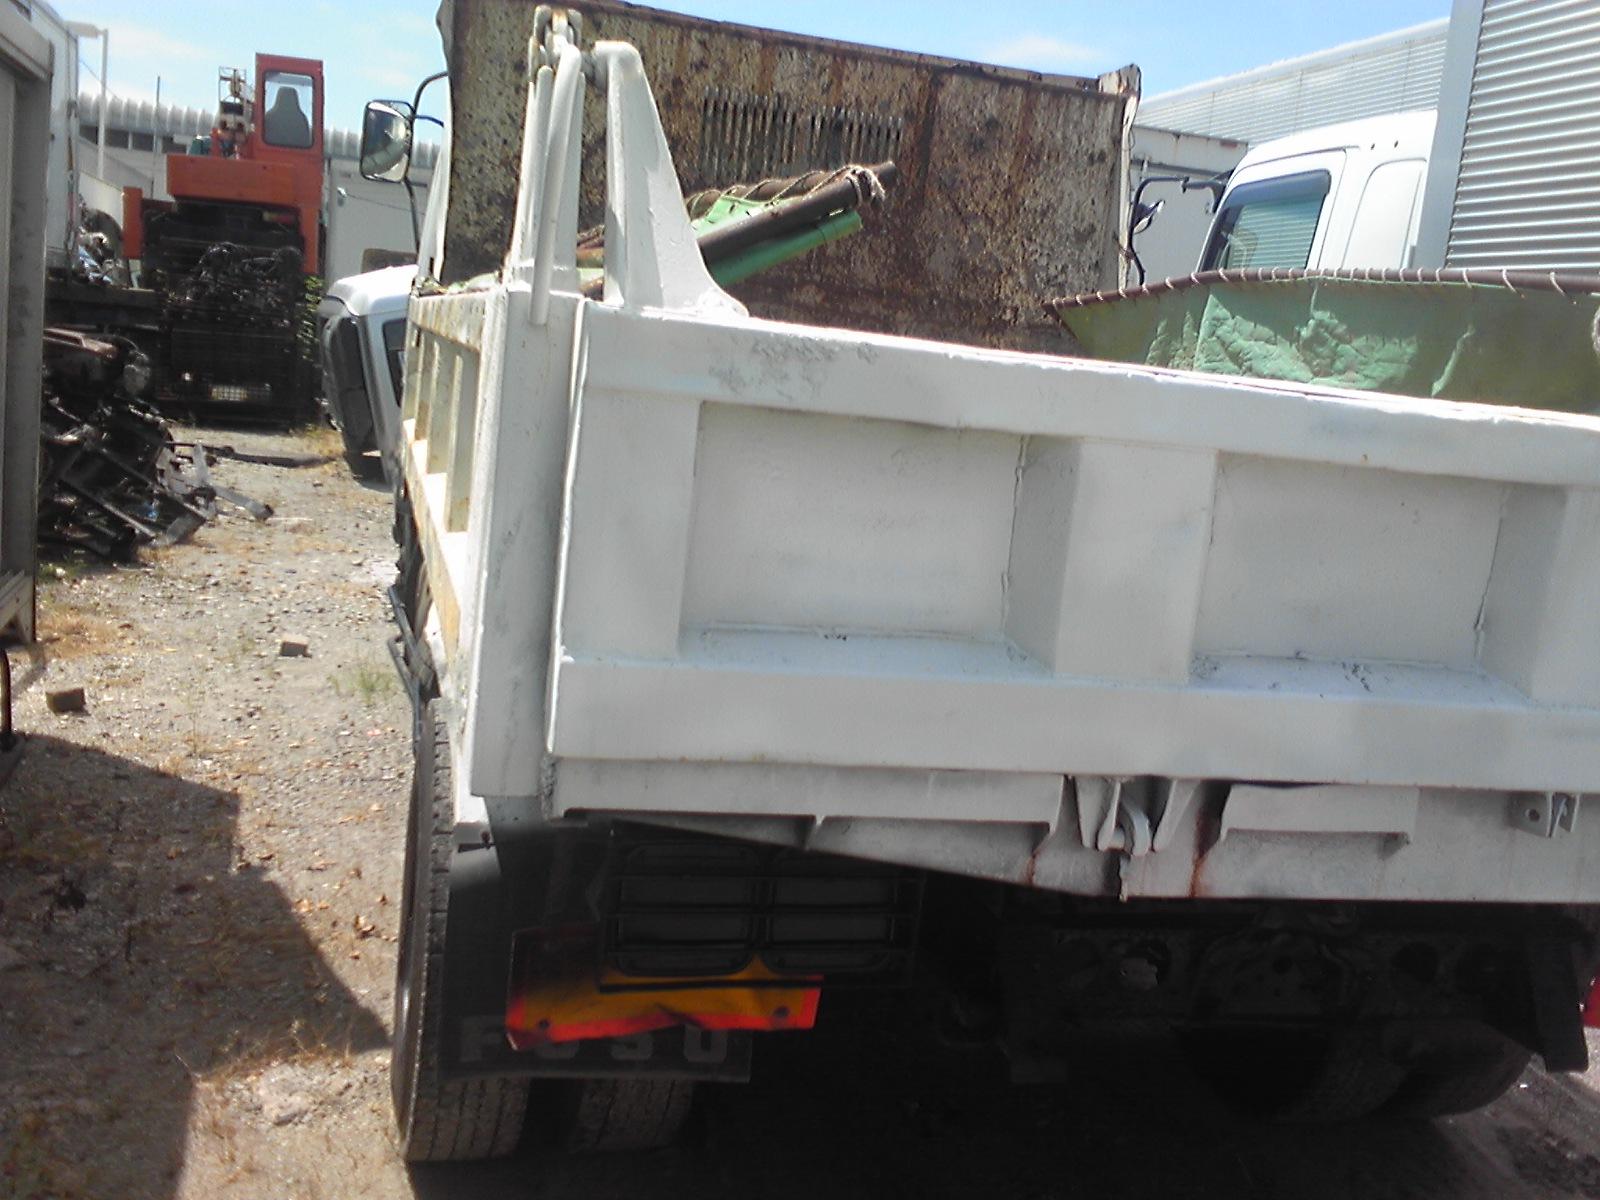 Canter truck sale double cabin 4wd japan import jpn car - 170804_125811_01